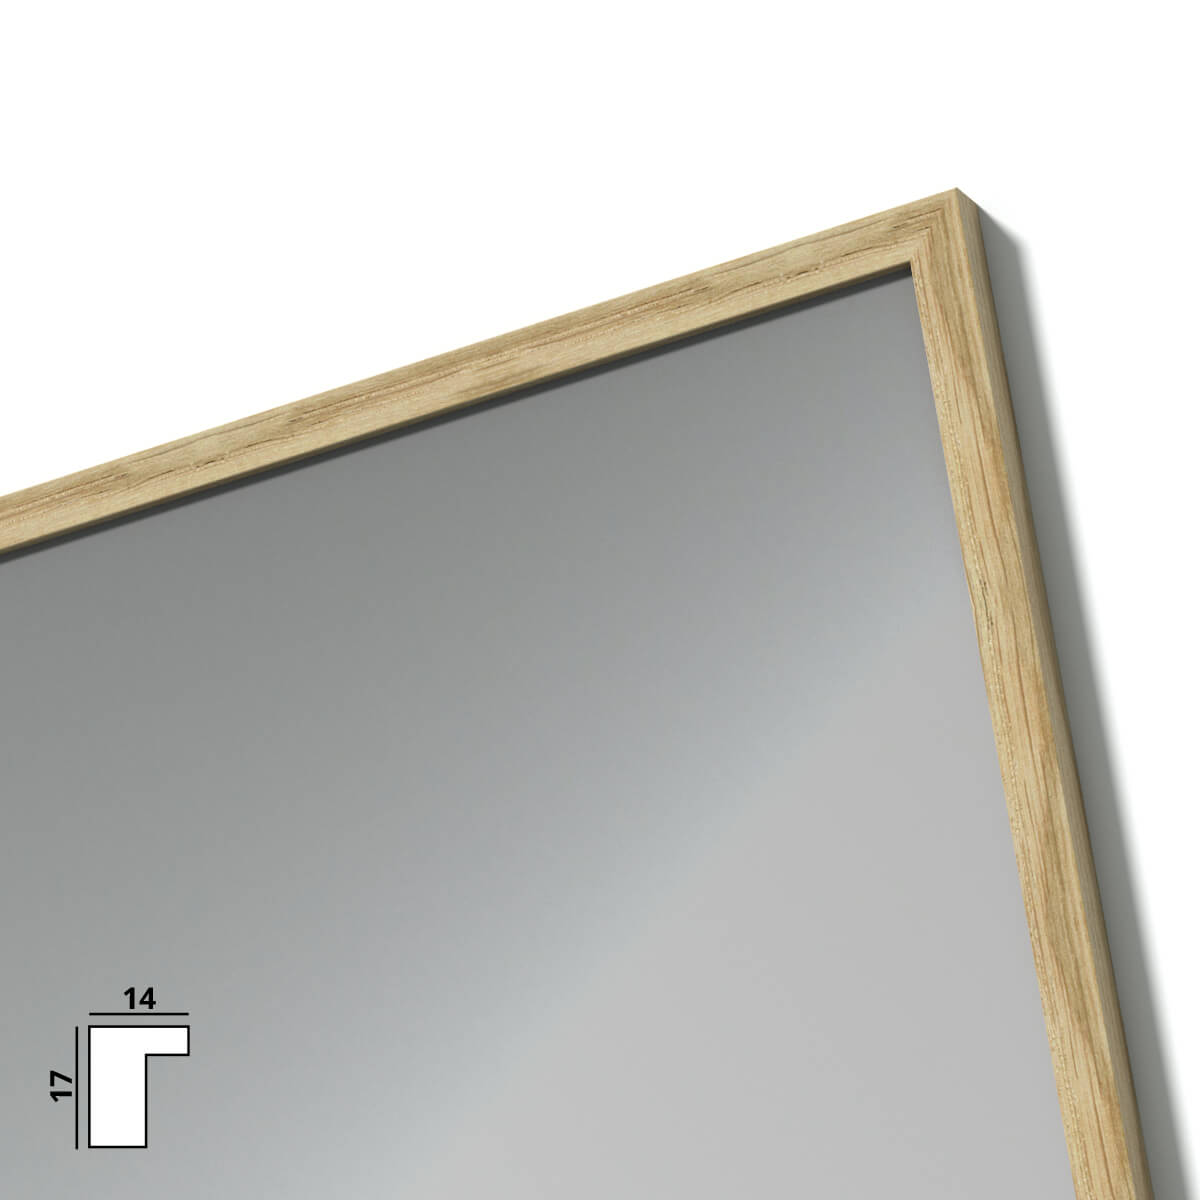 spiegel mit holzrahmen nach ma maas 989709718. Black Bedroom Furniture Sets. Home Design Ideas